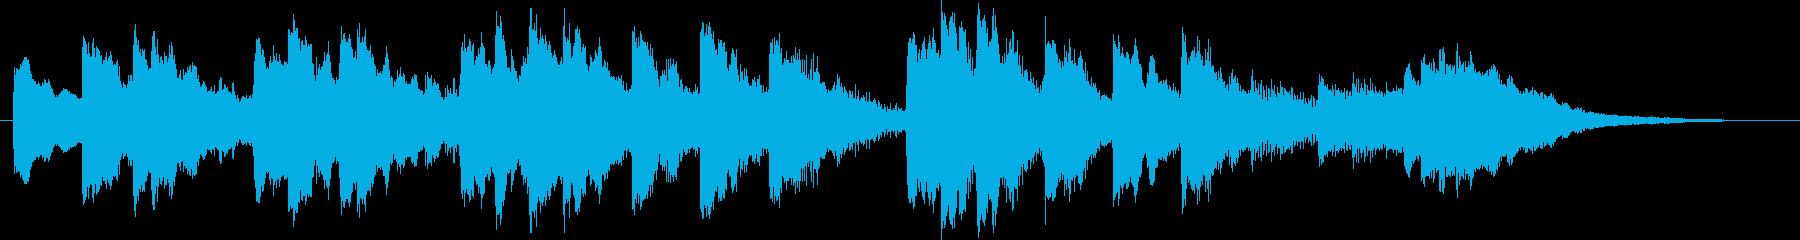 O Tannenbaum(チャイム)の再生済みの波形